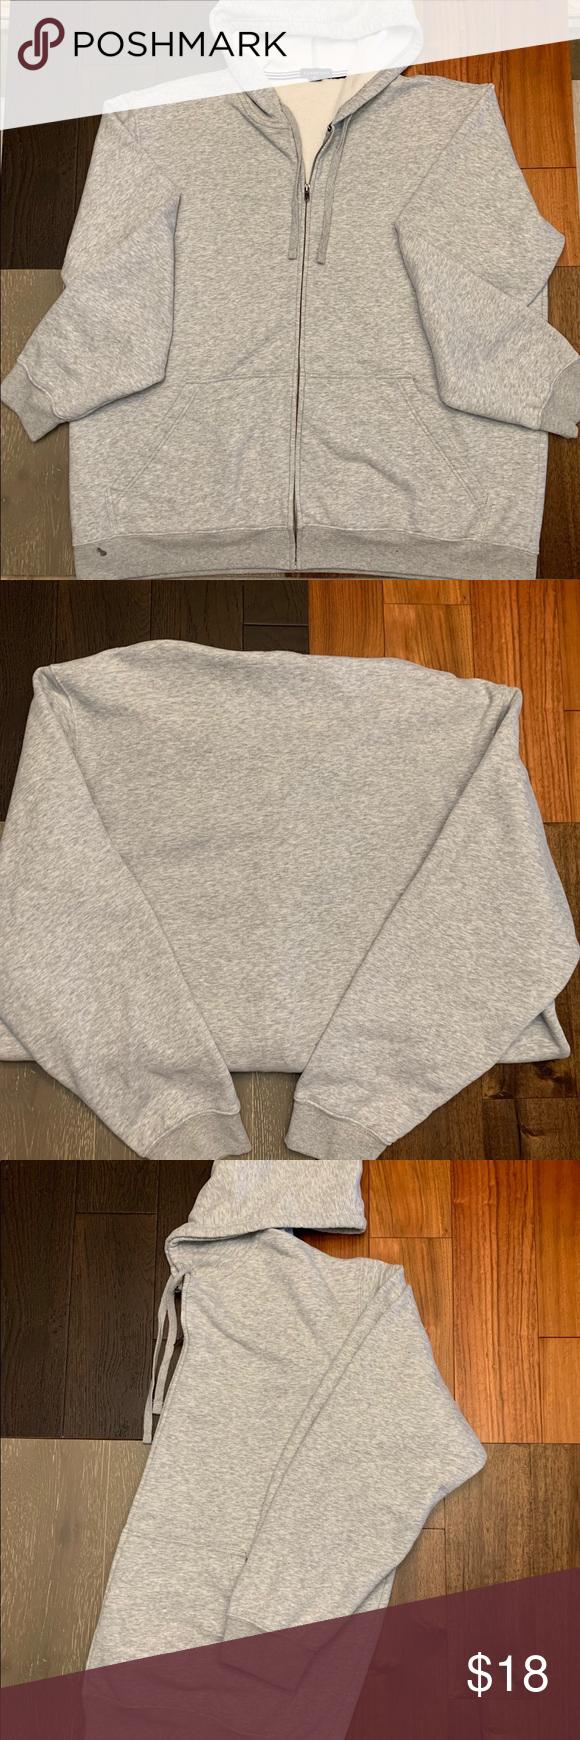 Lands End Sweatshirt Mens Size Xxl Hoodie With Zip Lands End Hoodie Sweatshirt With Zip Front And Hand Slip In Sweatshirt Shirt Mens Sweatshirts Clothes Design [ 1740 x 580 Pixel ]